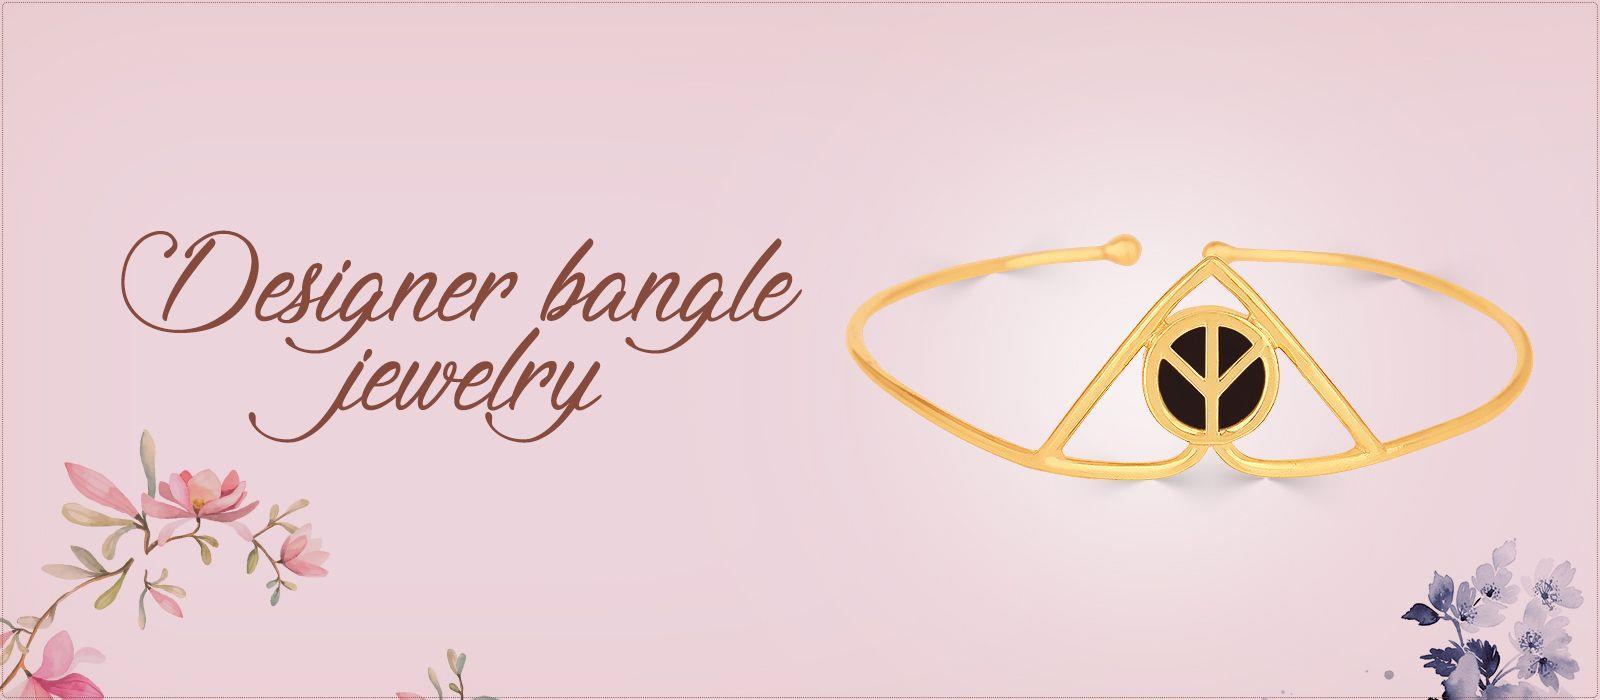 Designer bangles jewelry